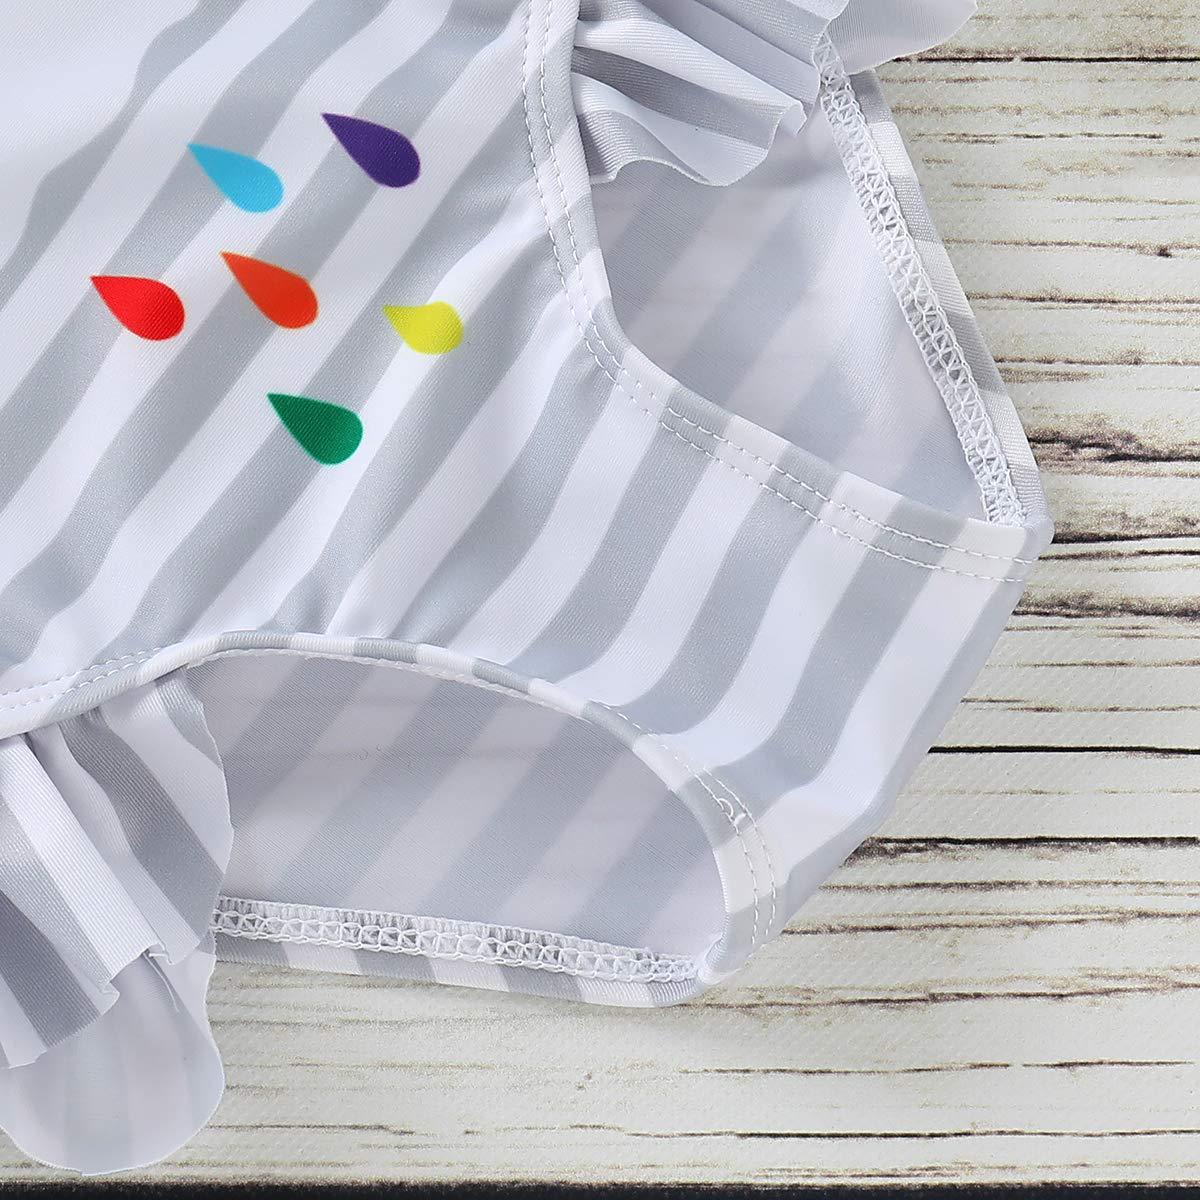 6M-5T Toddler Baby Girls One-Piece Swimsuit Beachwear Twins Rainbow Striped Swimwear Sister Matching Bathing Suits